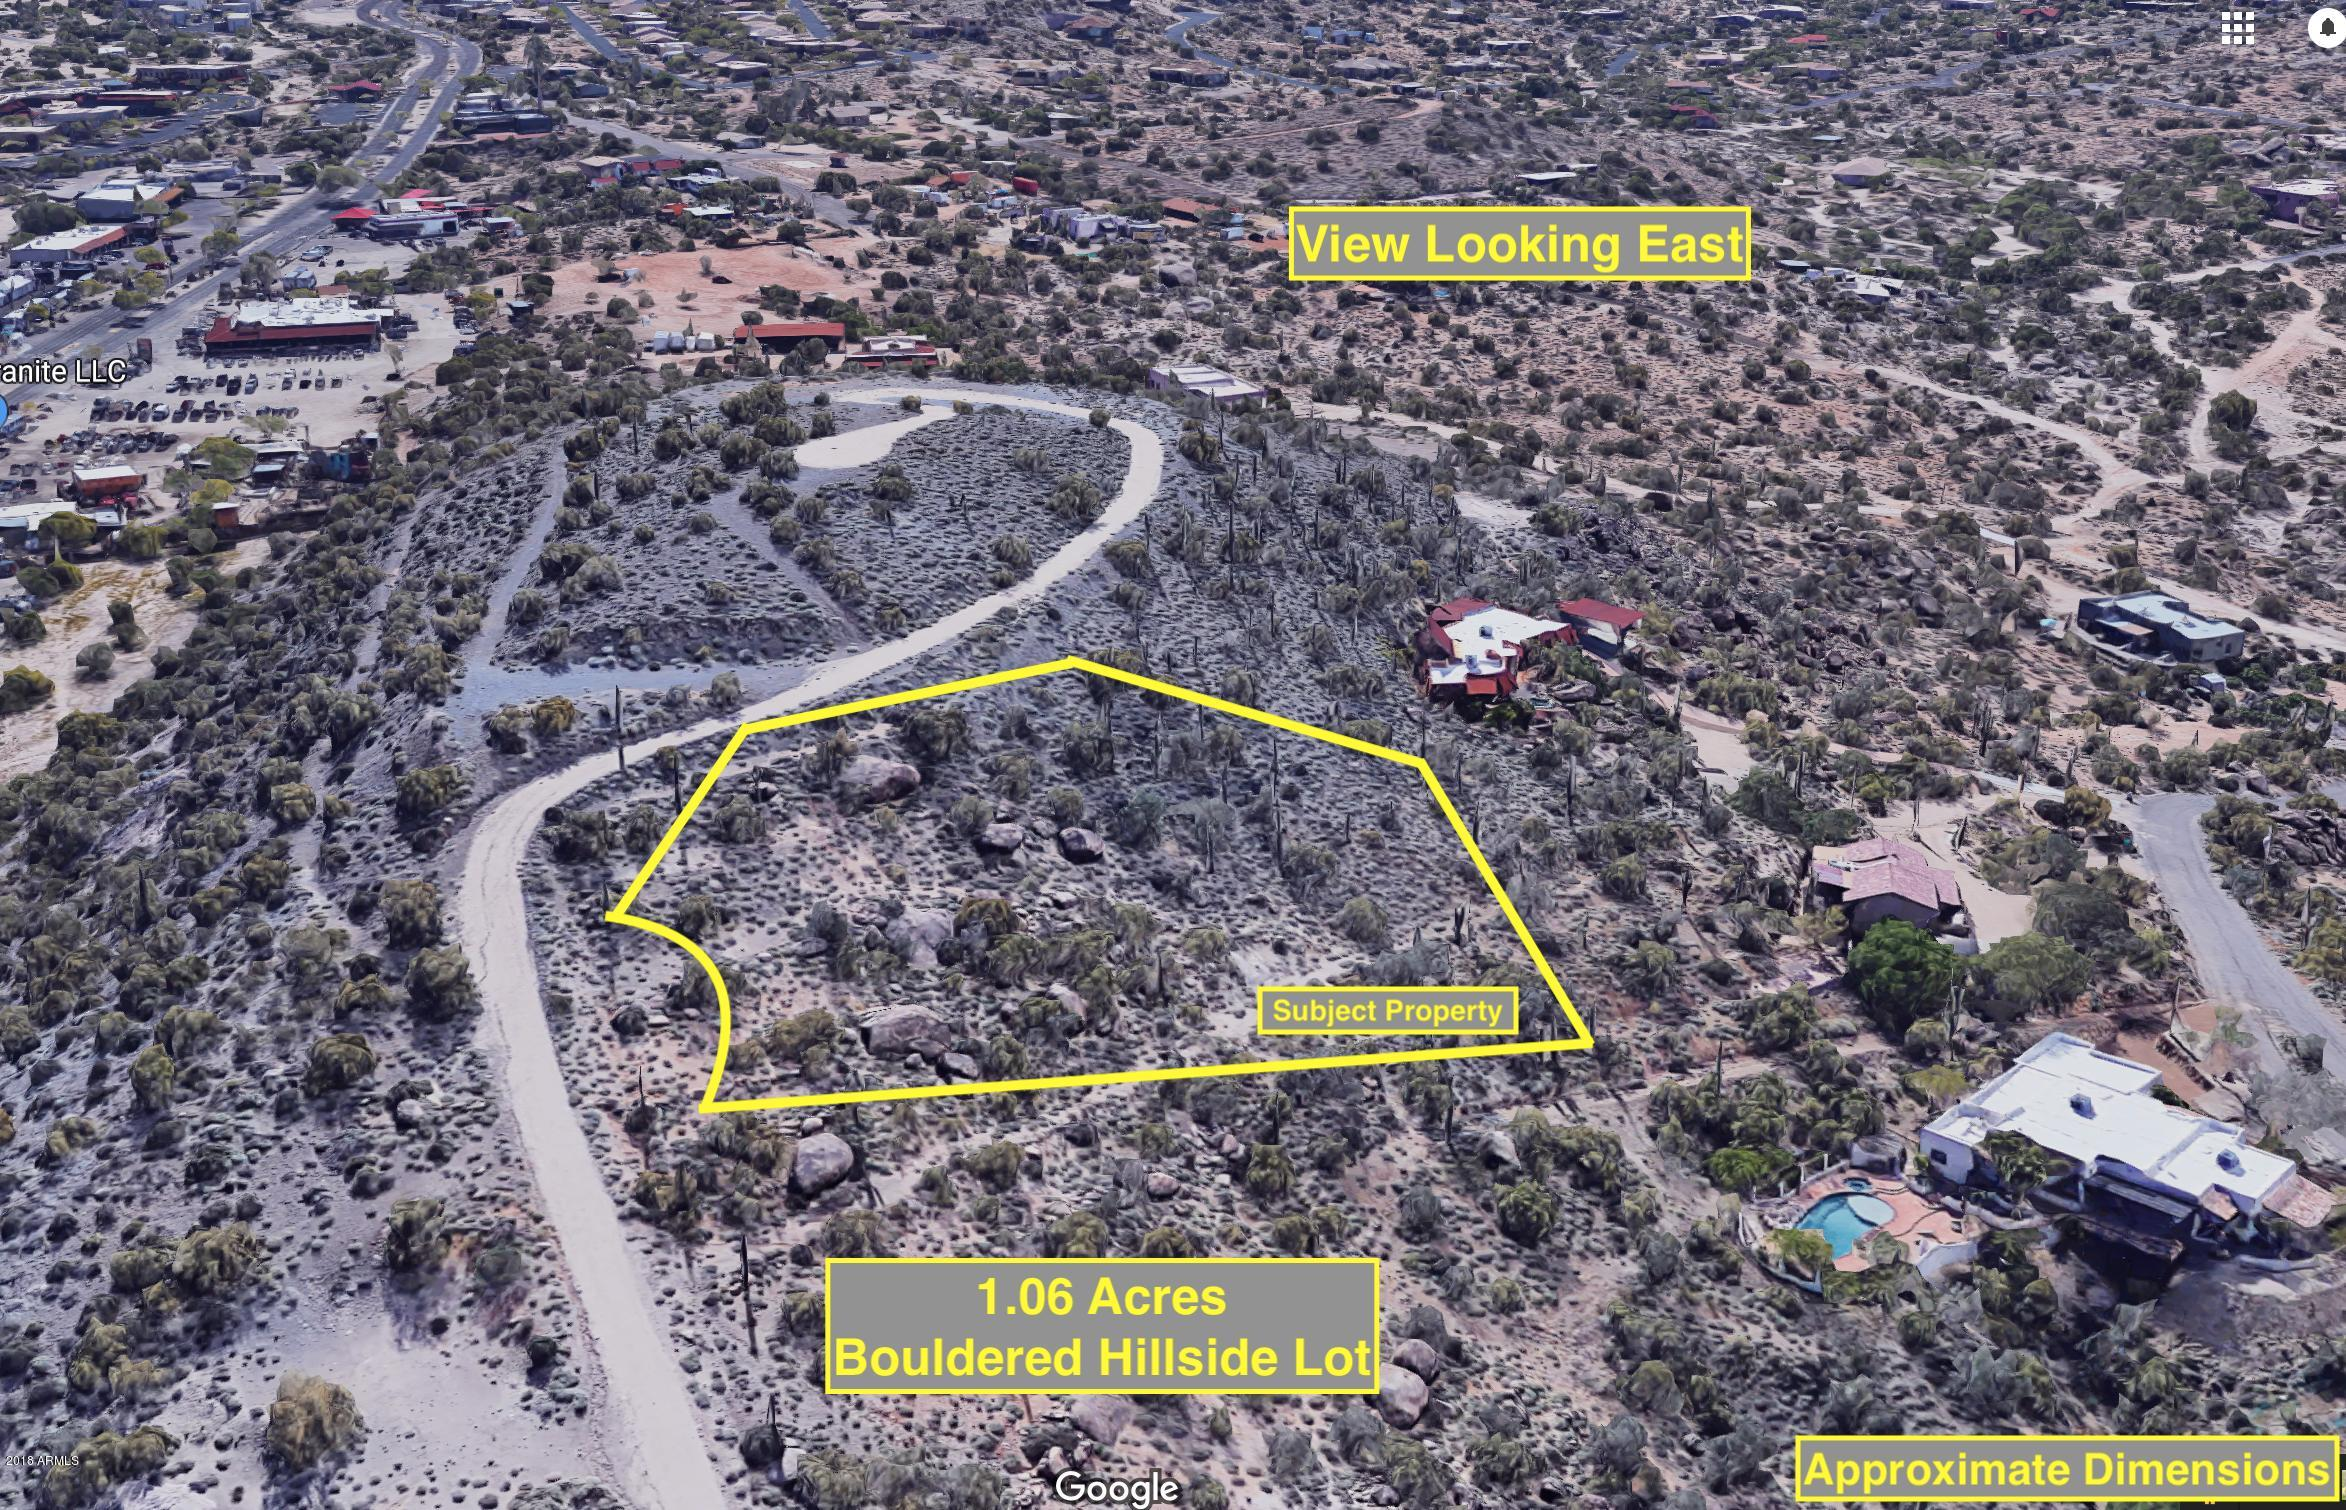 6696 E Military Road # 1, Cave Creek, AZ 85331, ,Land,For Sale,6696 E Military Road # 1,5789083